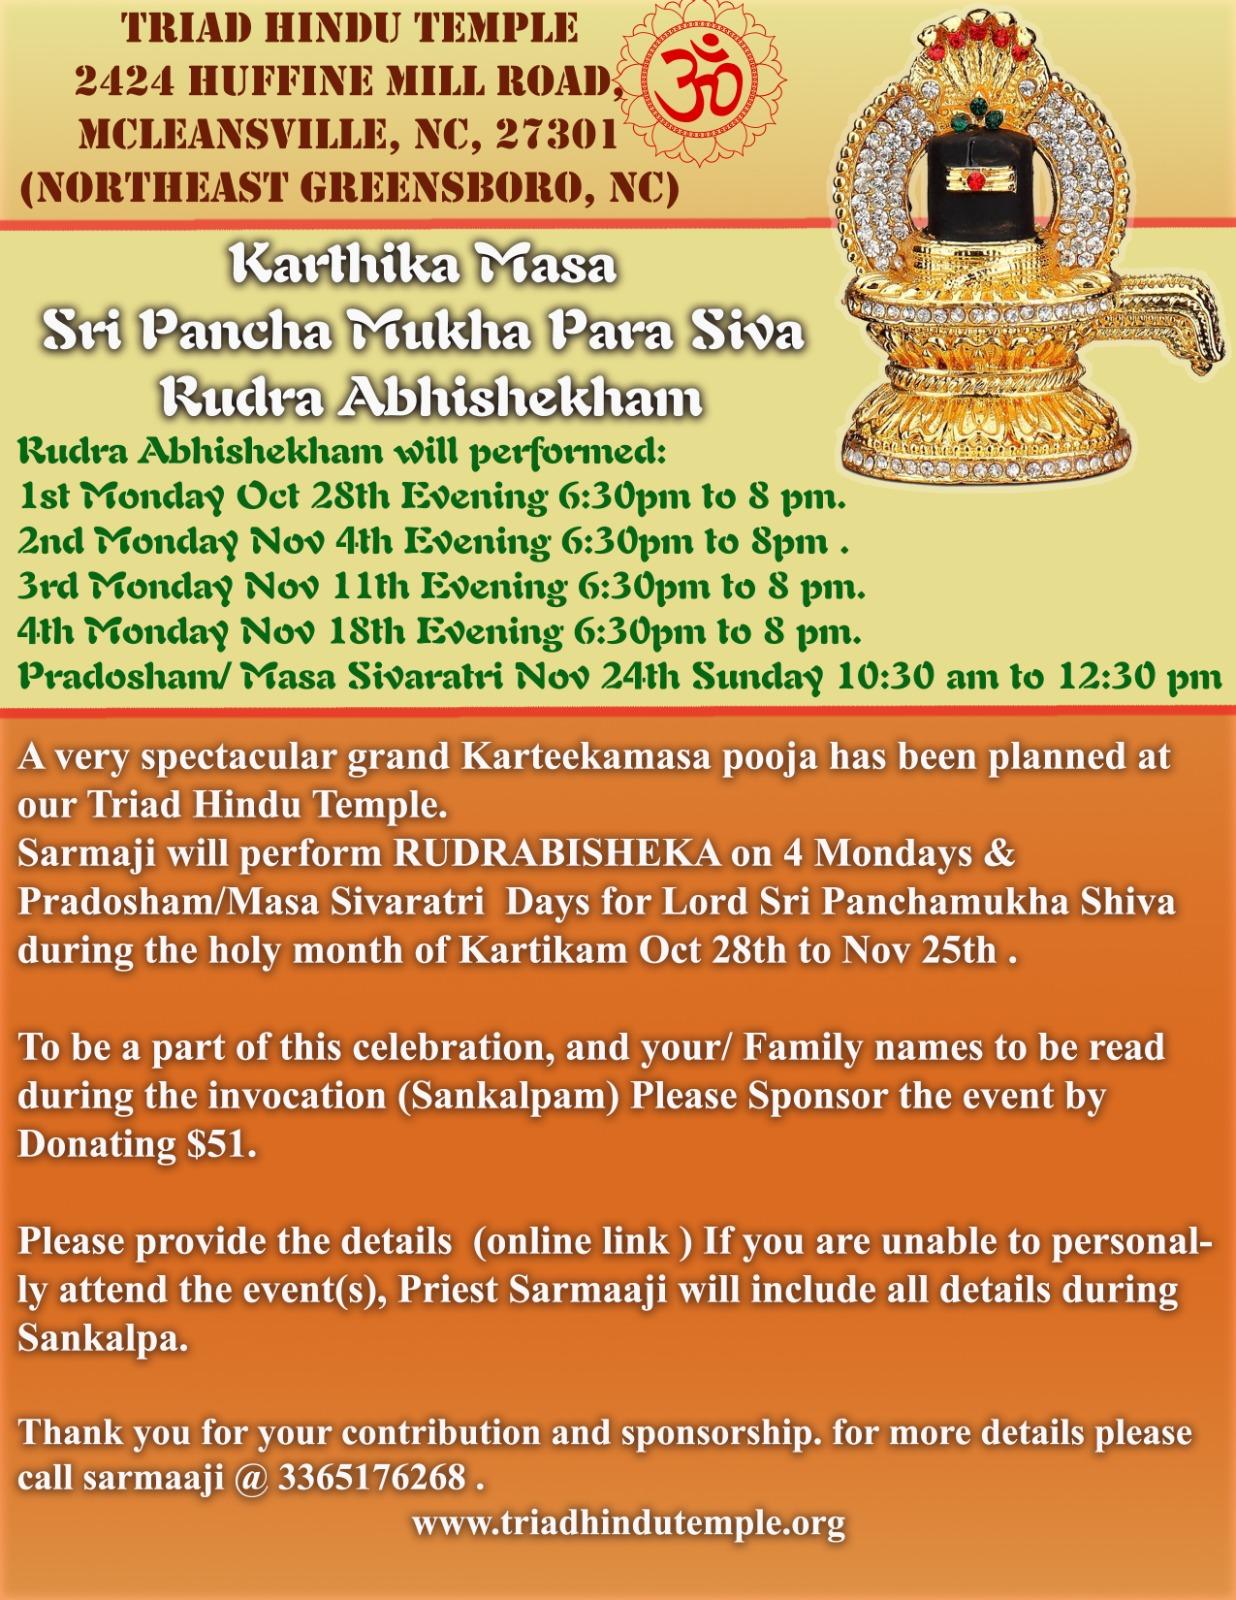 Kartheeka Masam Monday's Panchamukha Shivalinga RudraAbhishekam